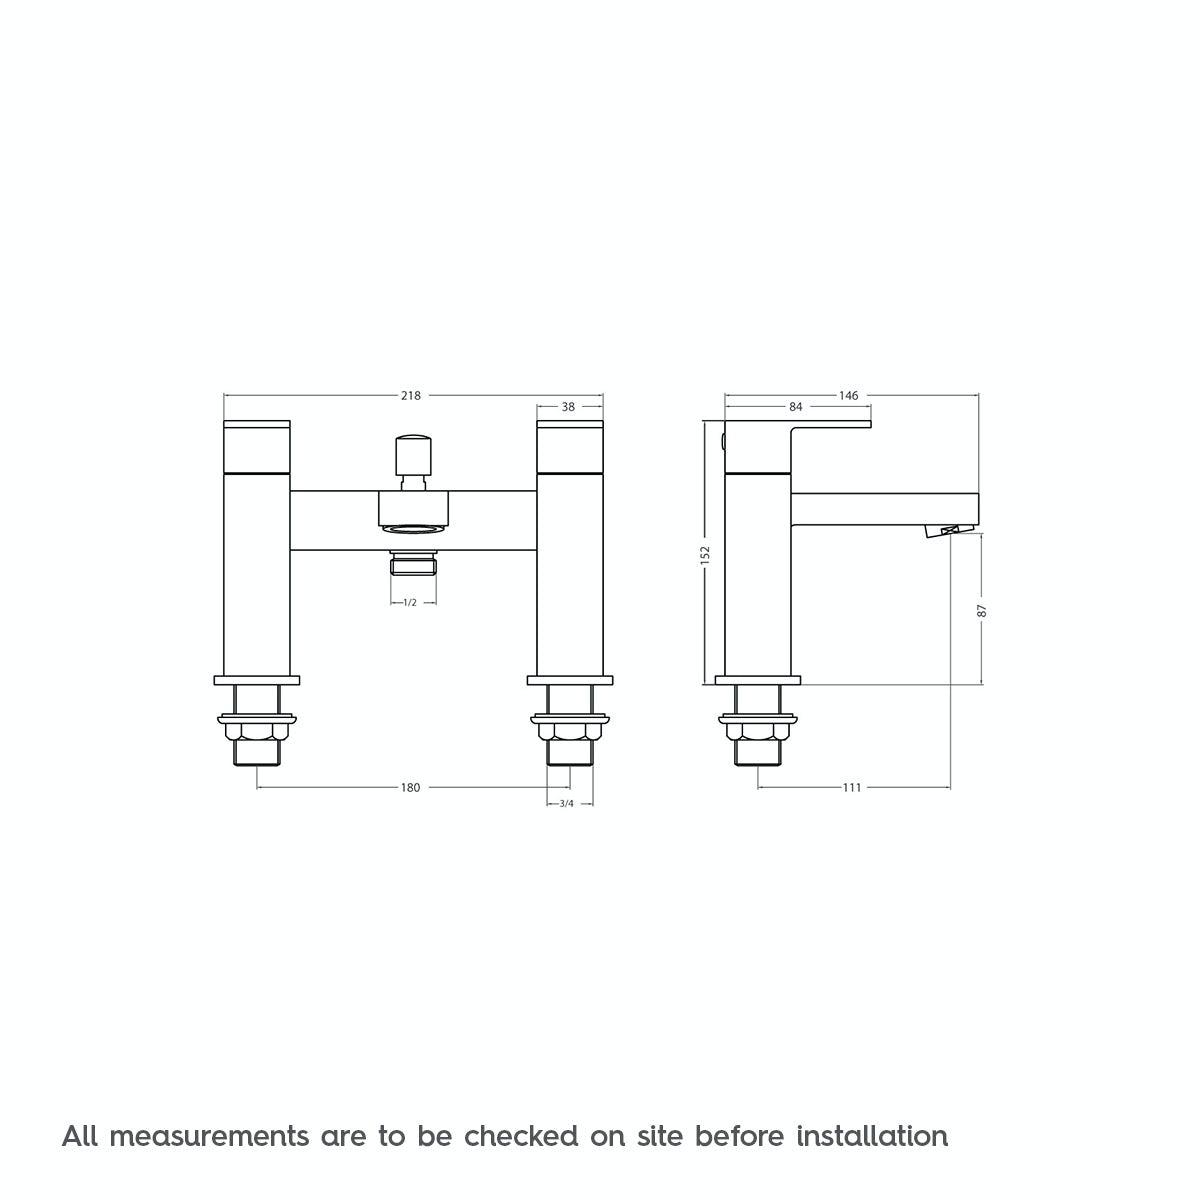 Dimensions for Richmond bath shower mixer tap